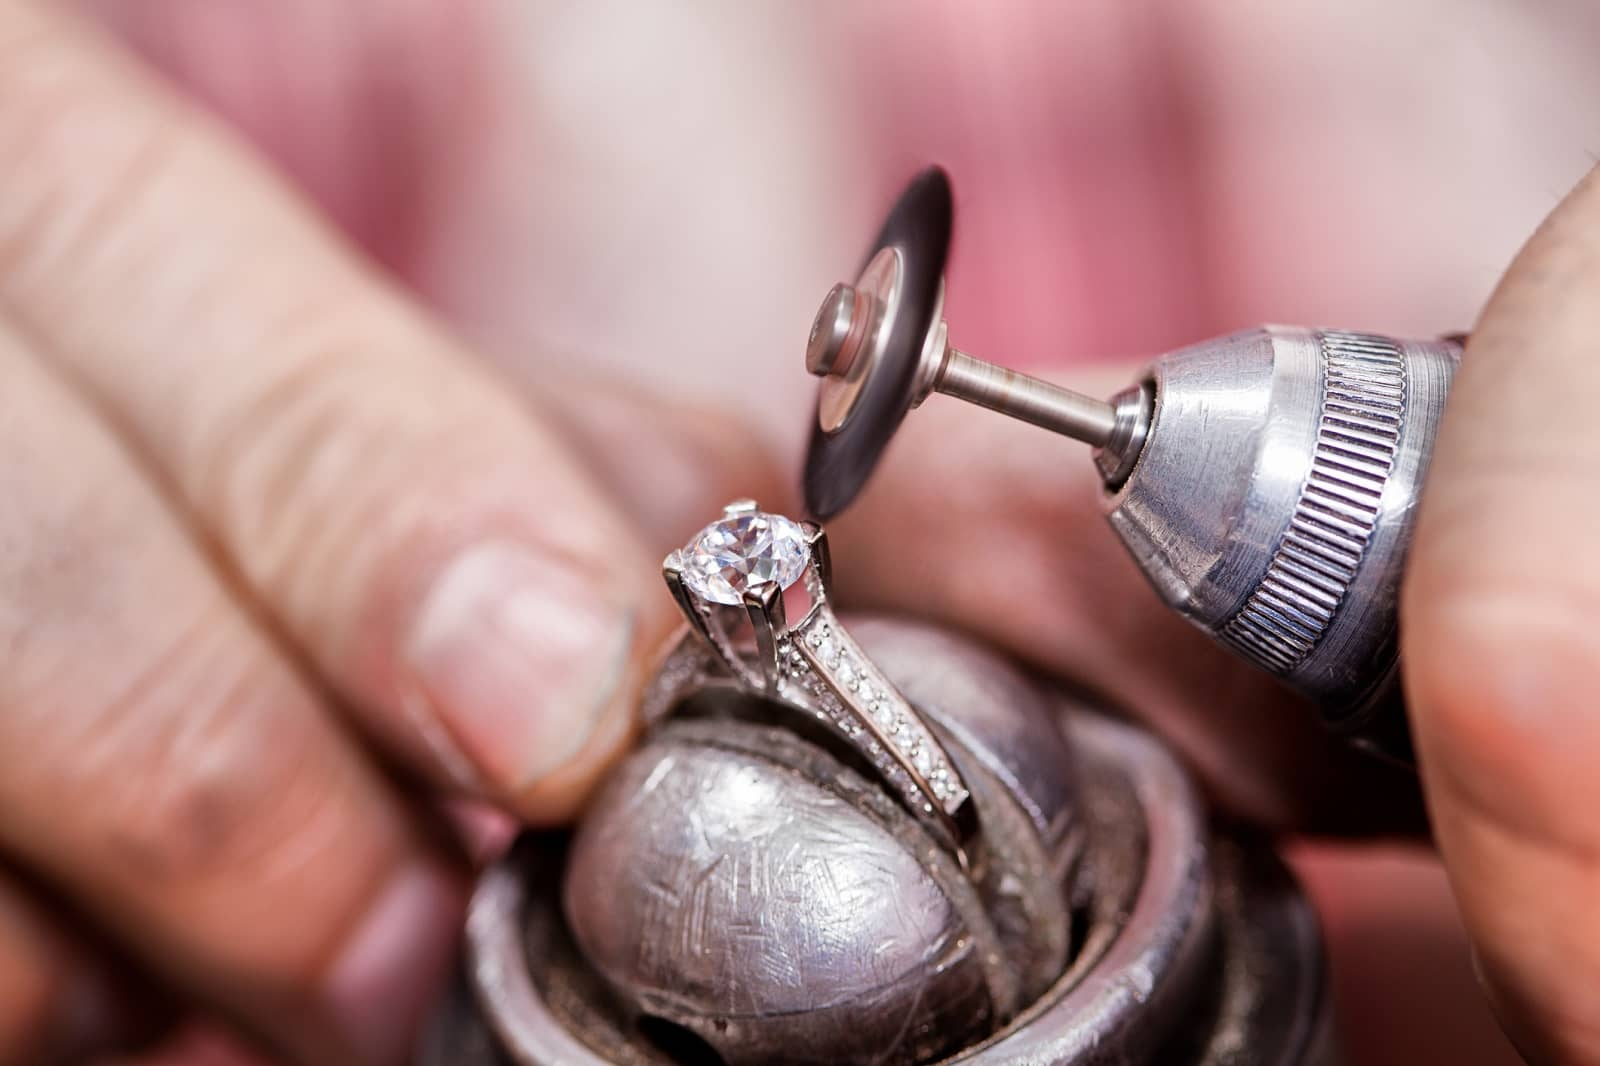 Repairing diamond ring